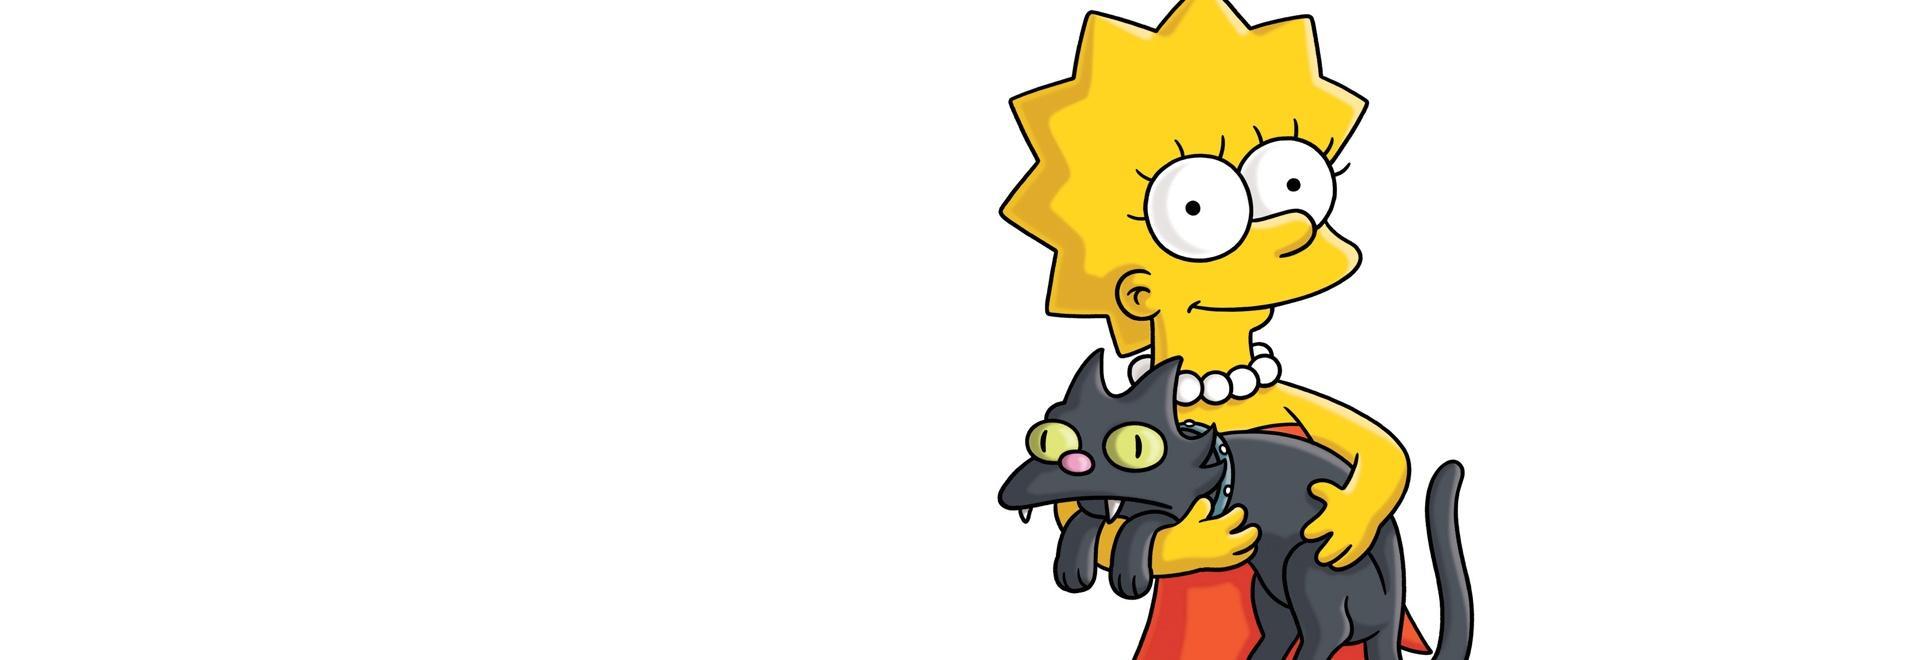 Marge giocatrice